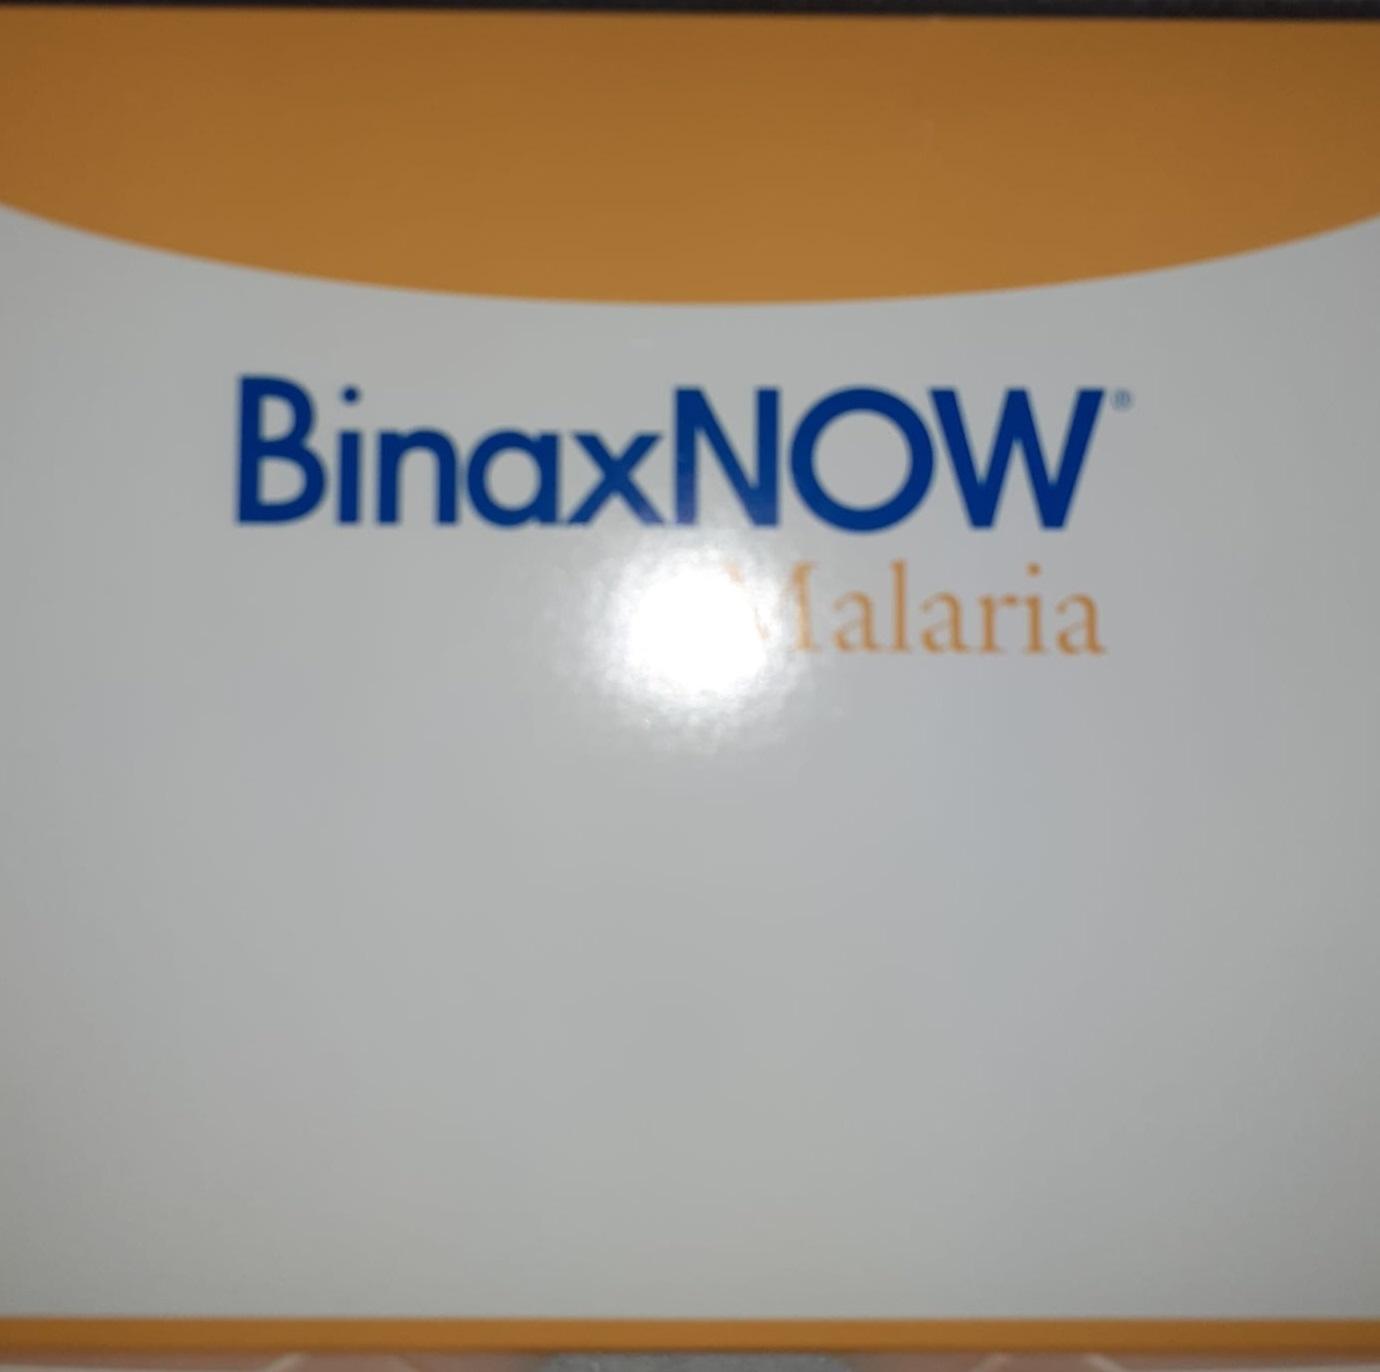 BinaxNOW Malaria